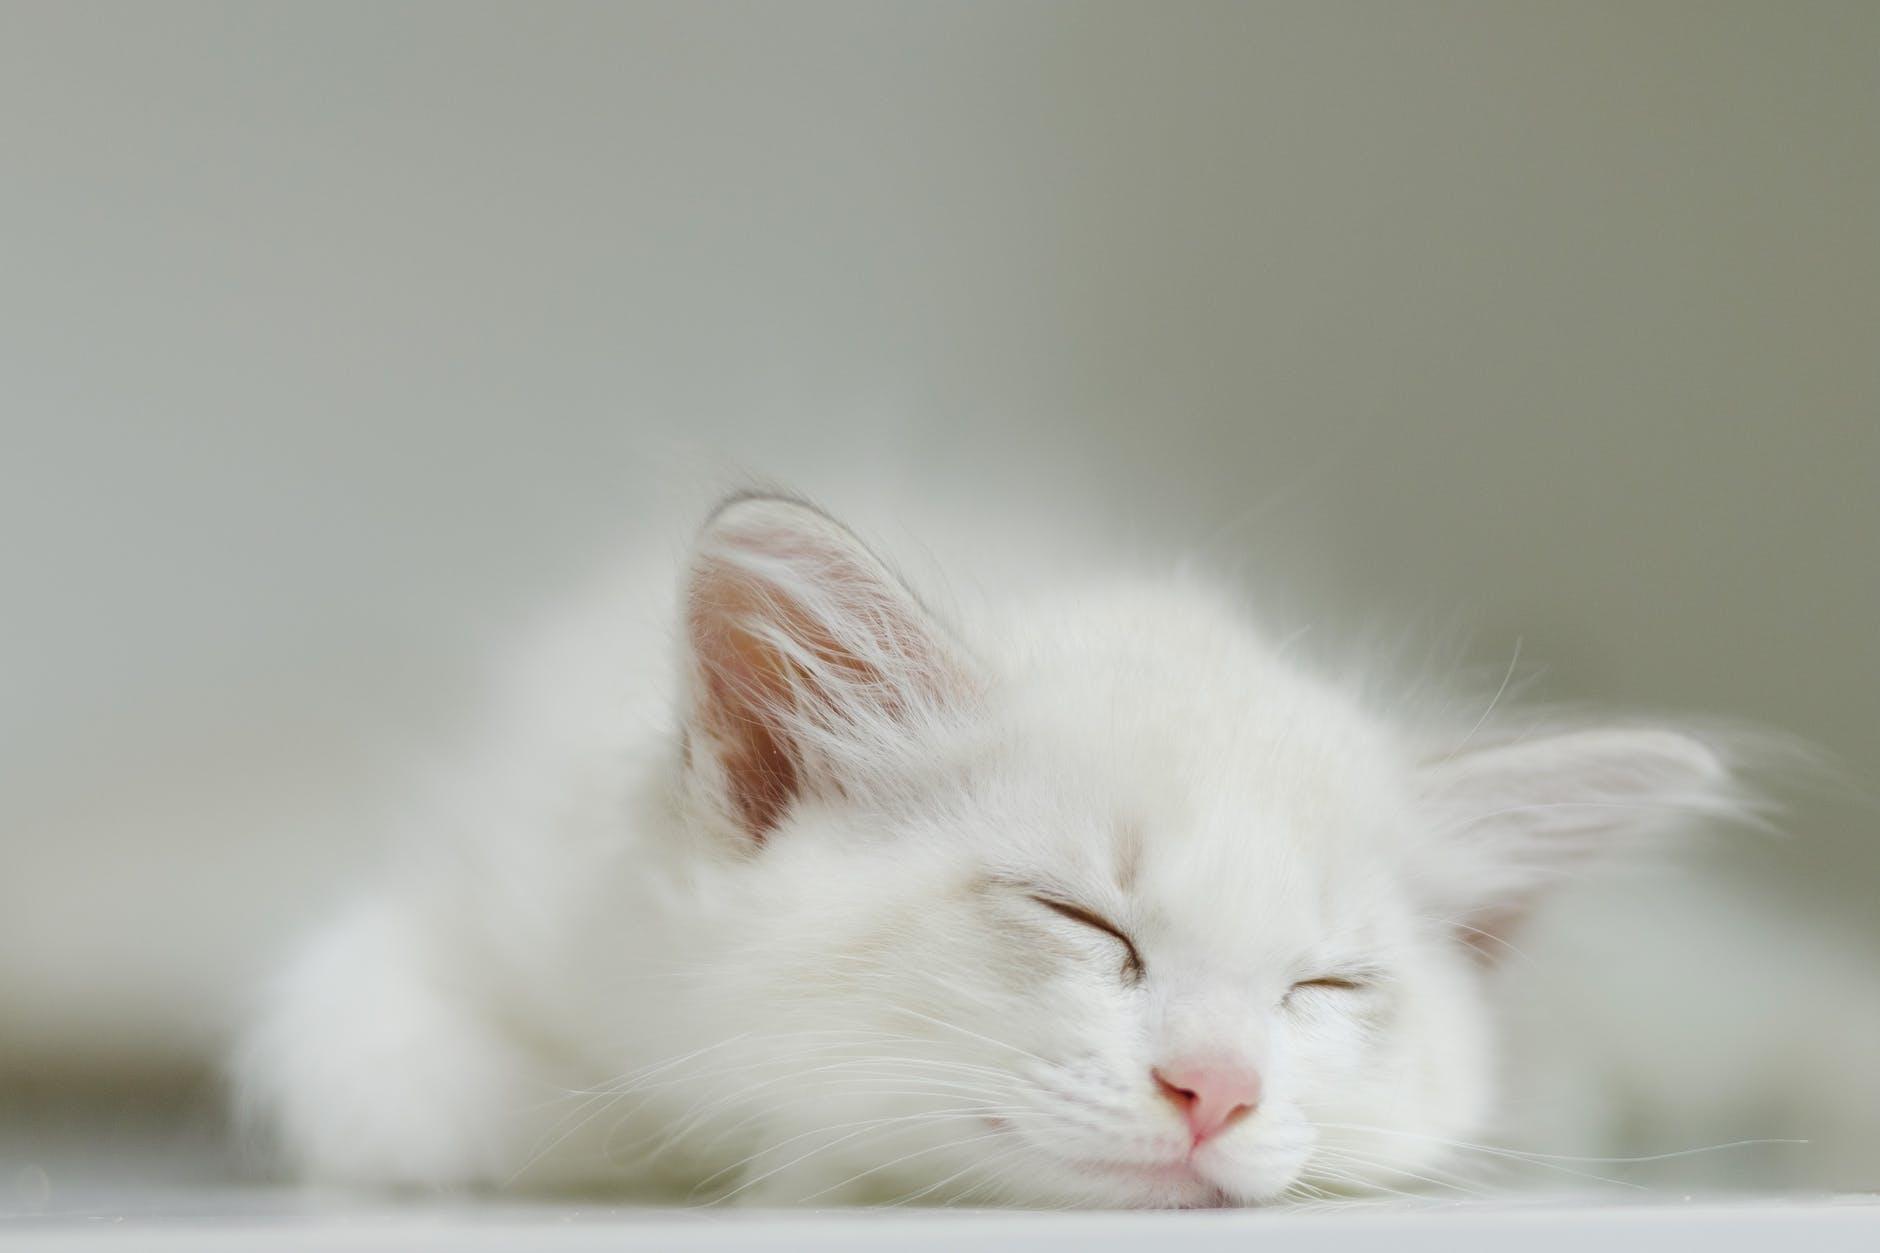 cute white kitty peacefully sleeping